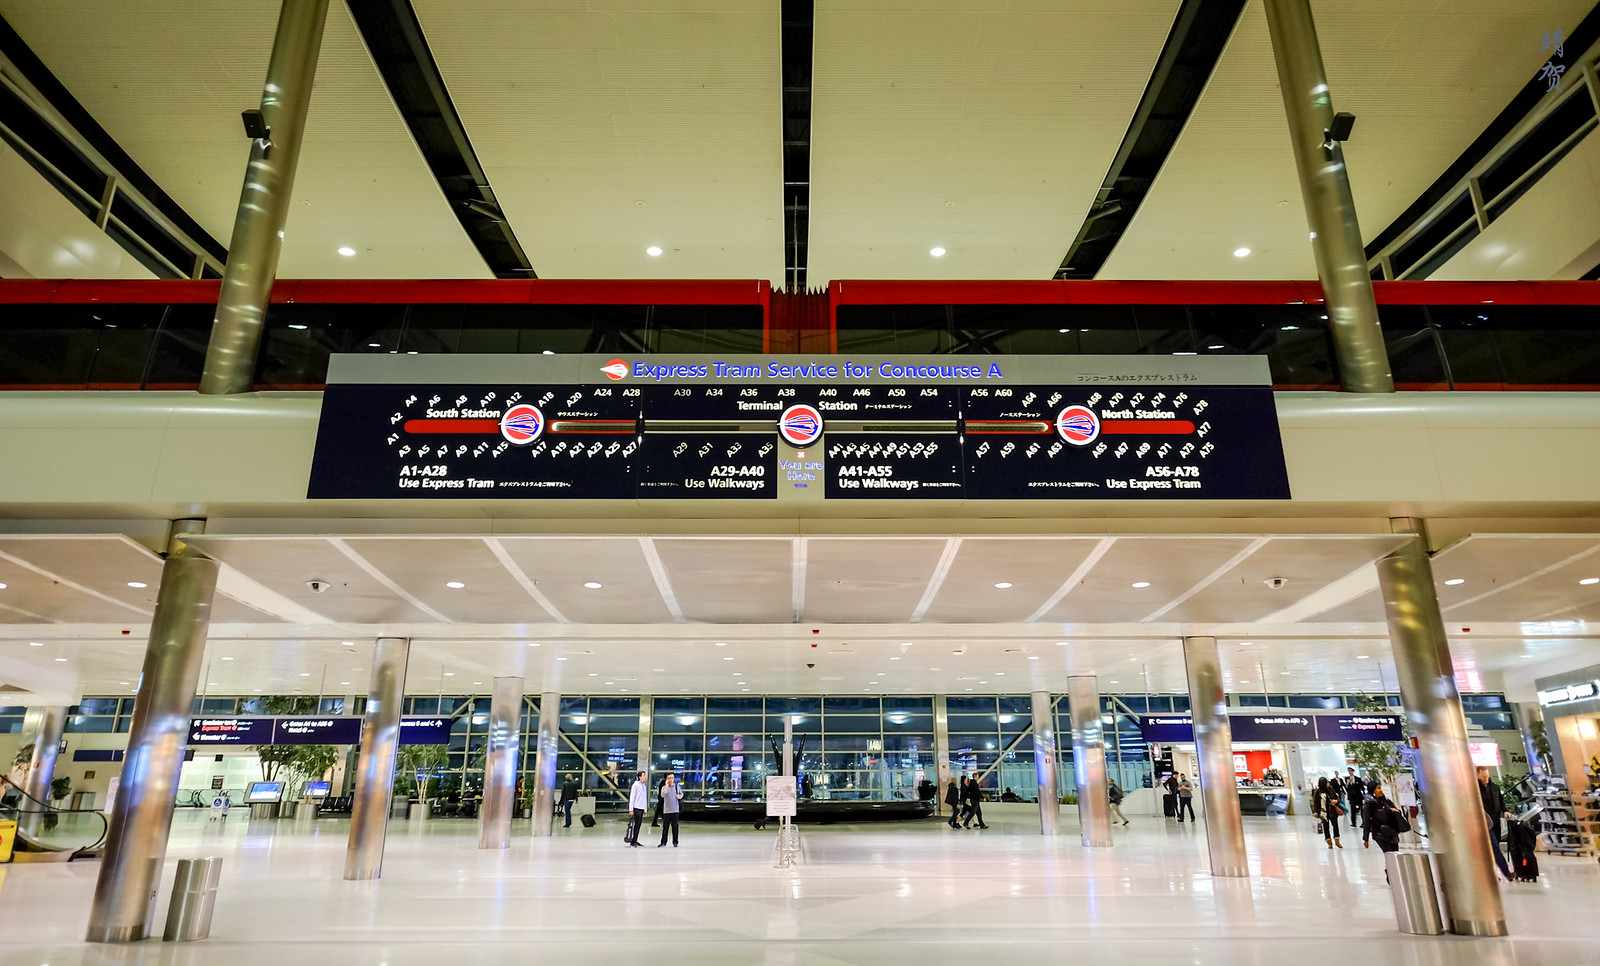 Concourse A transit information